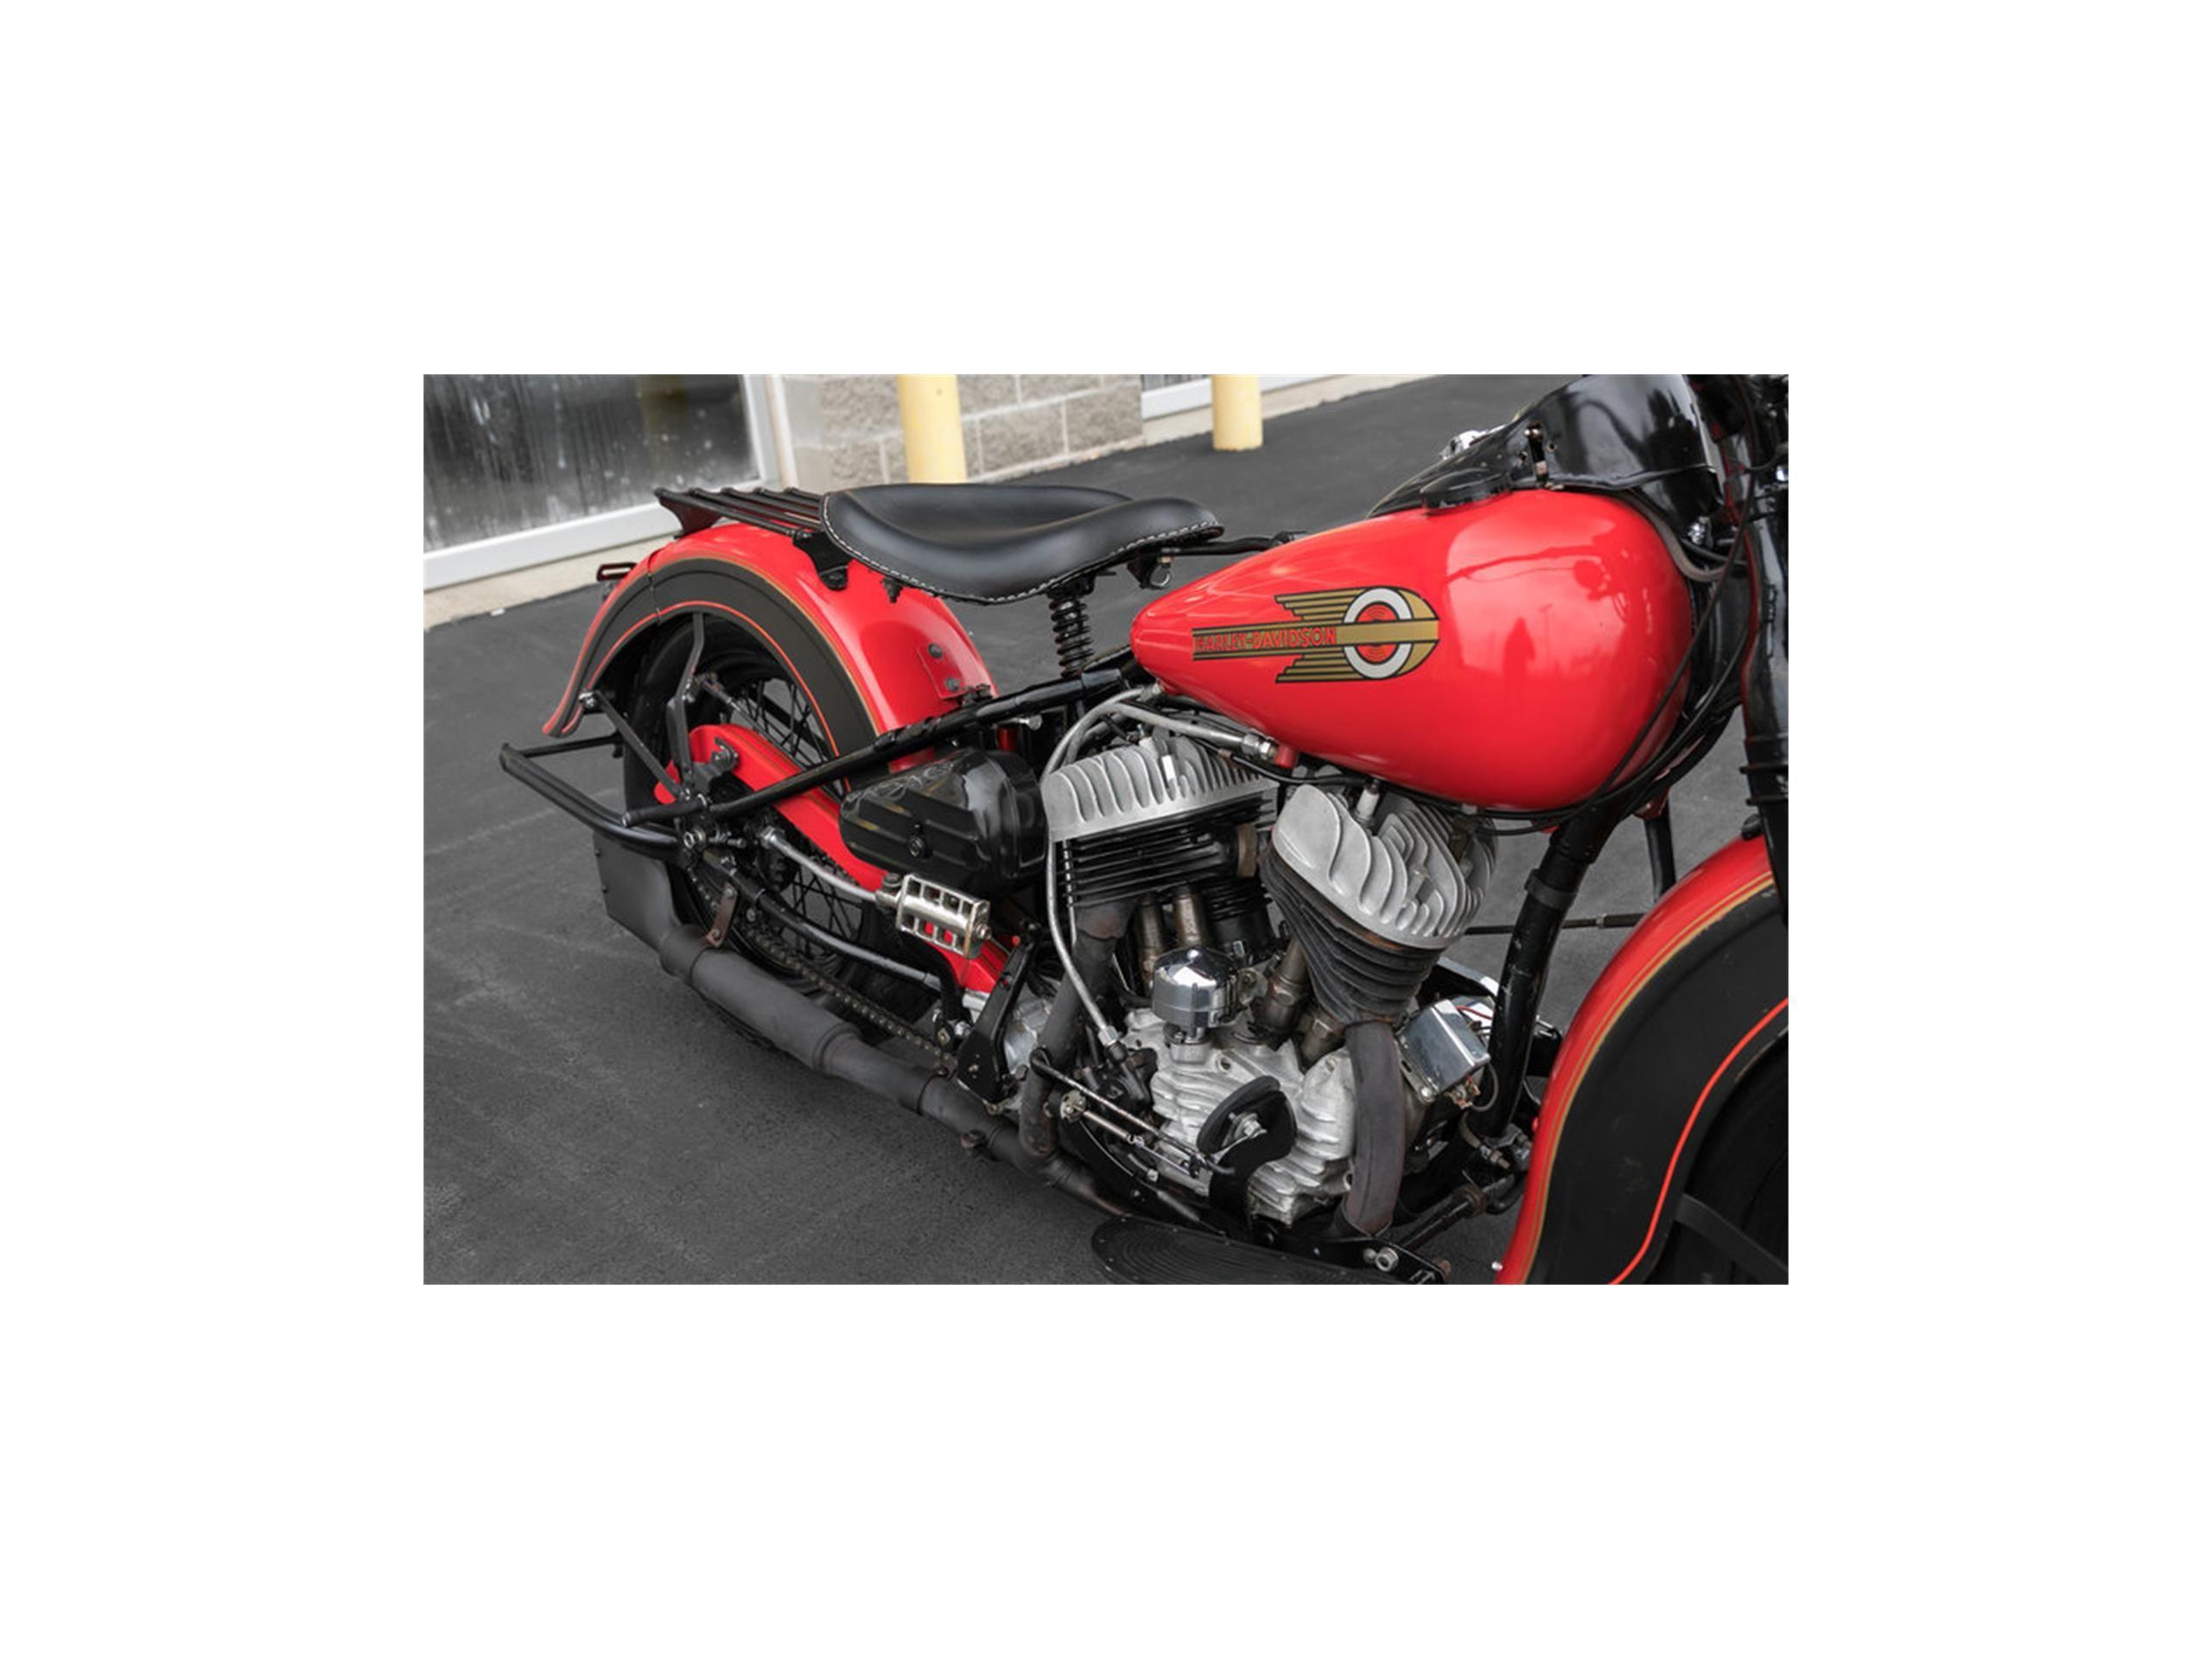 1941 HarleyDavidson Motorcycle (CC1058819) for sale in